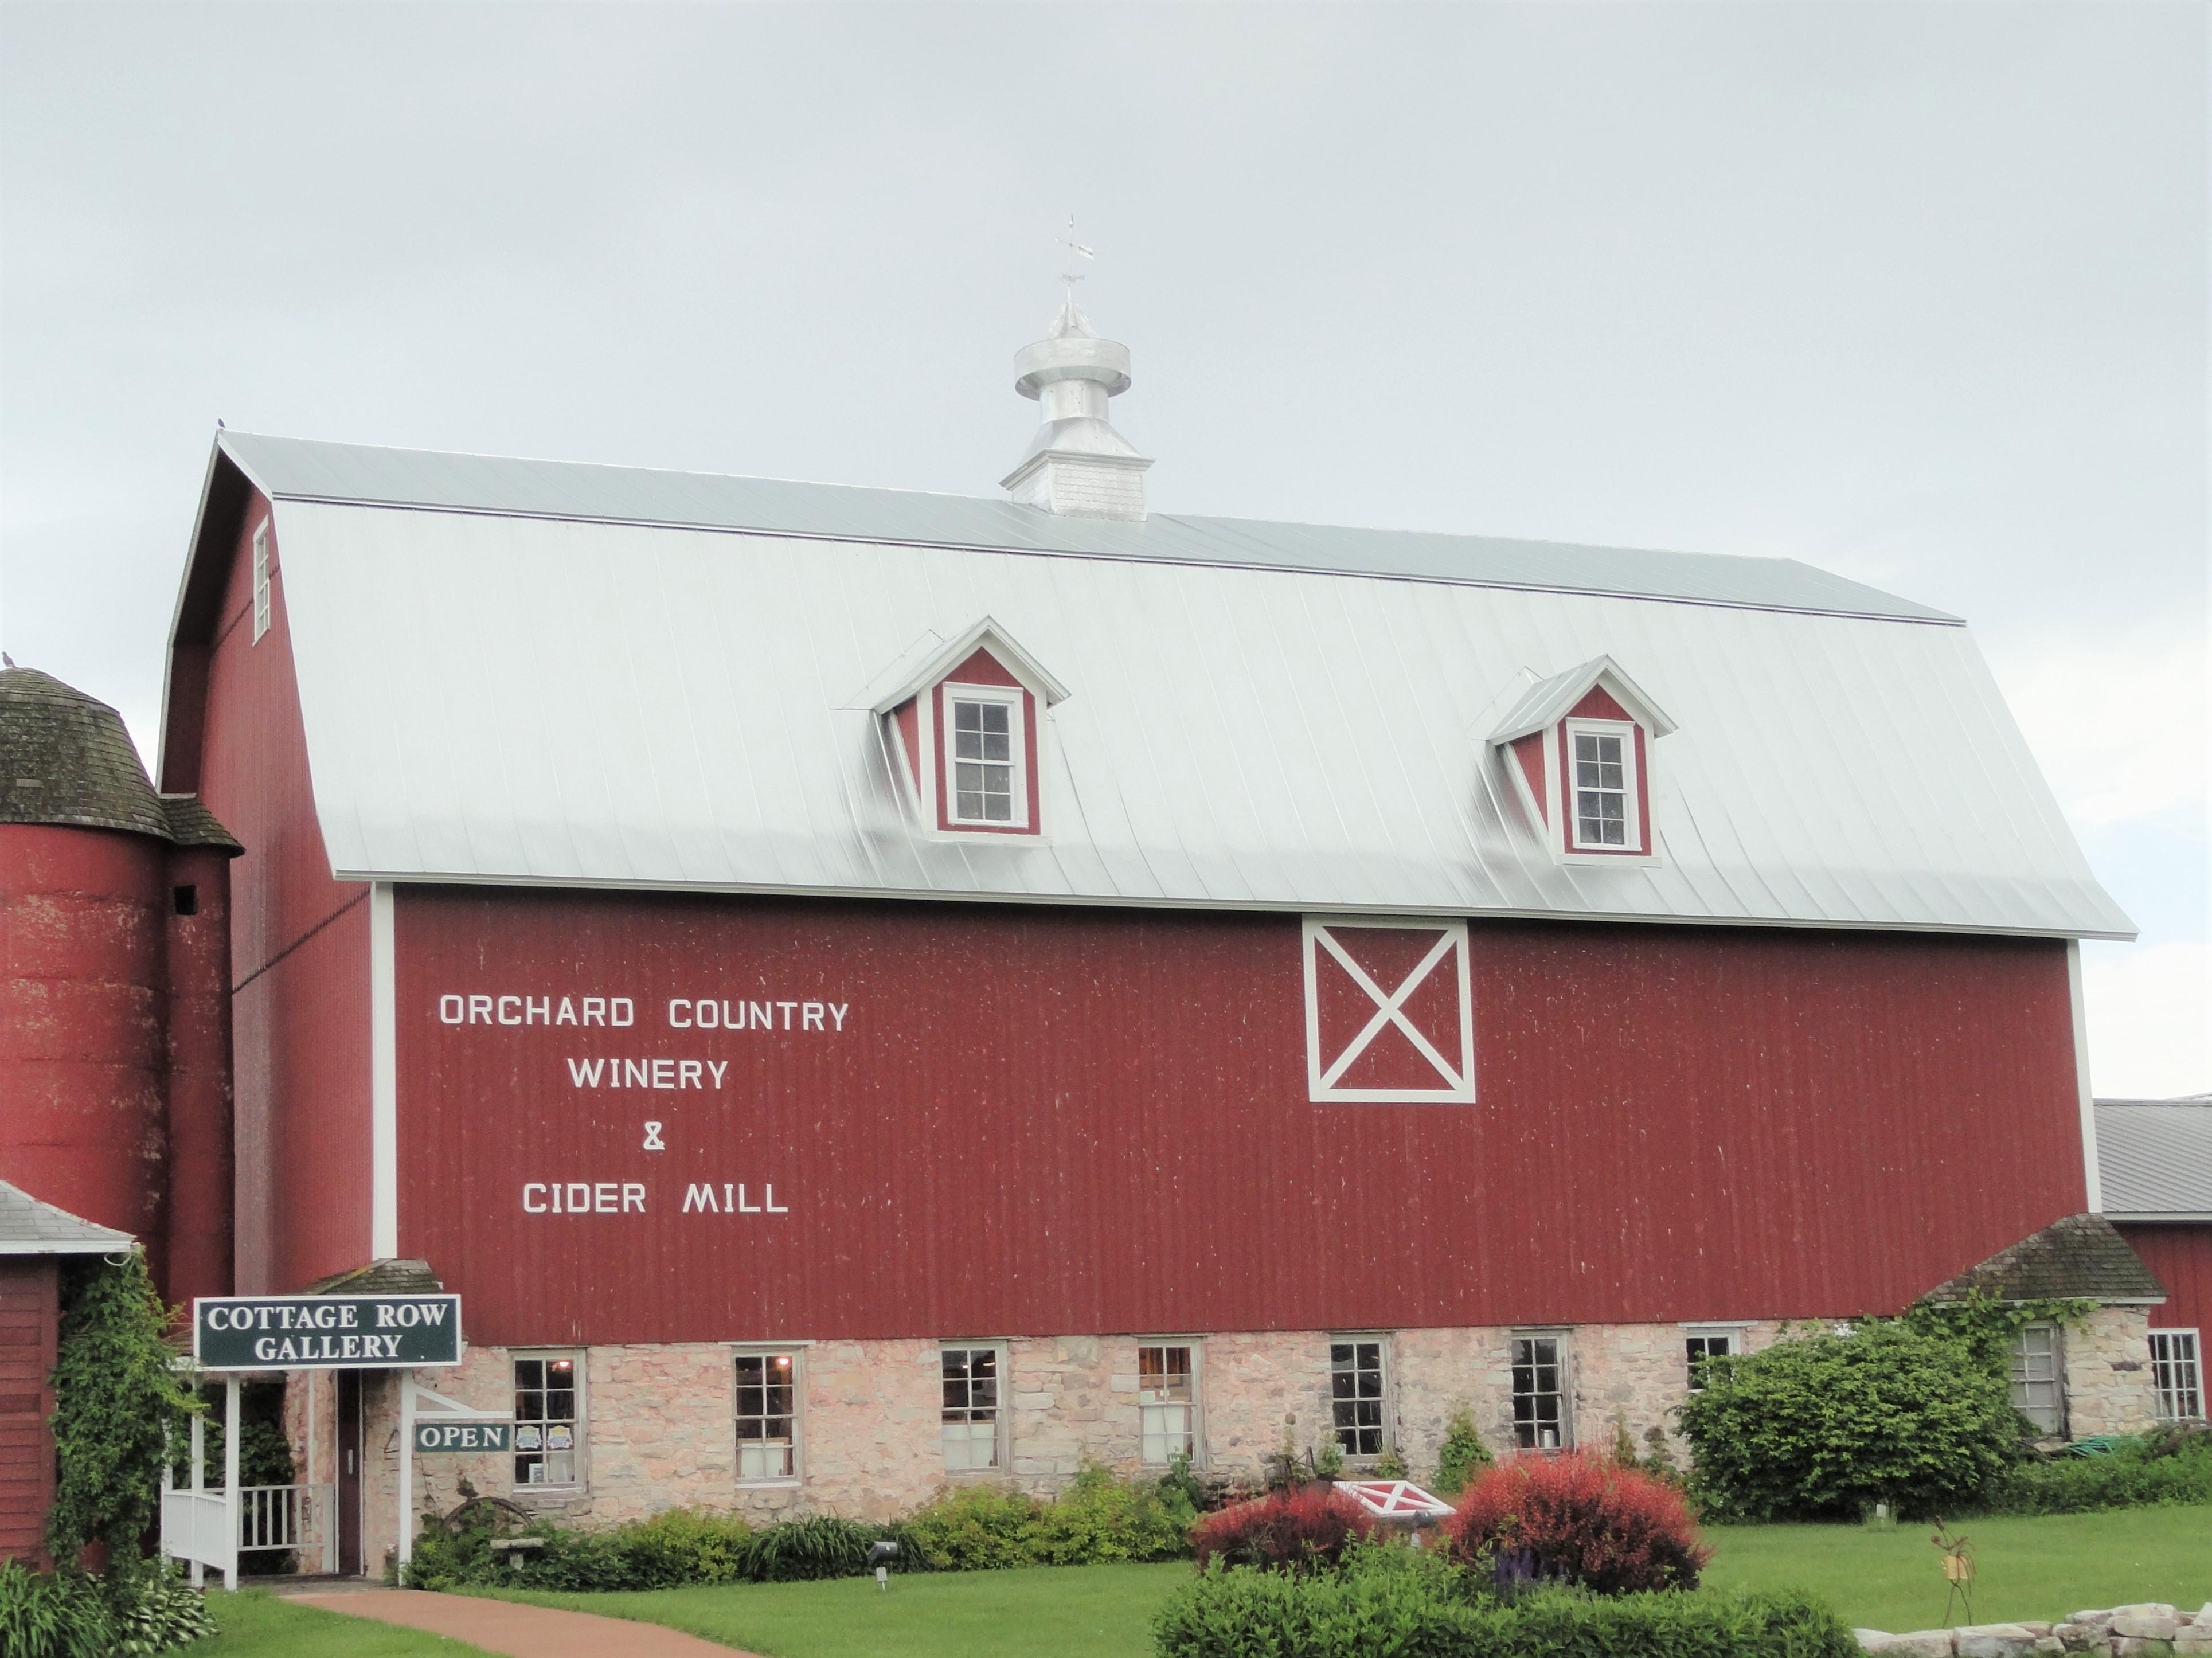 agricultural hip barn galvanized silver double lock standing seam sheet metal roofing culpitt wisconsin iowa illinois north dakota minnesota